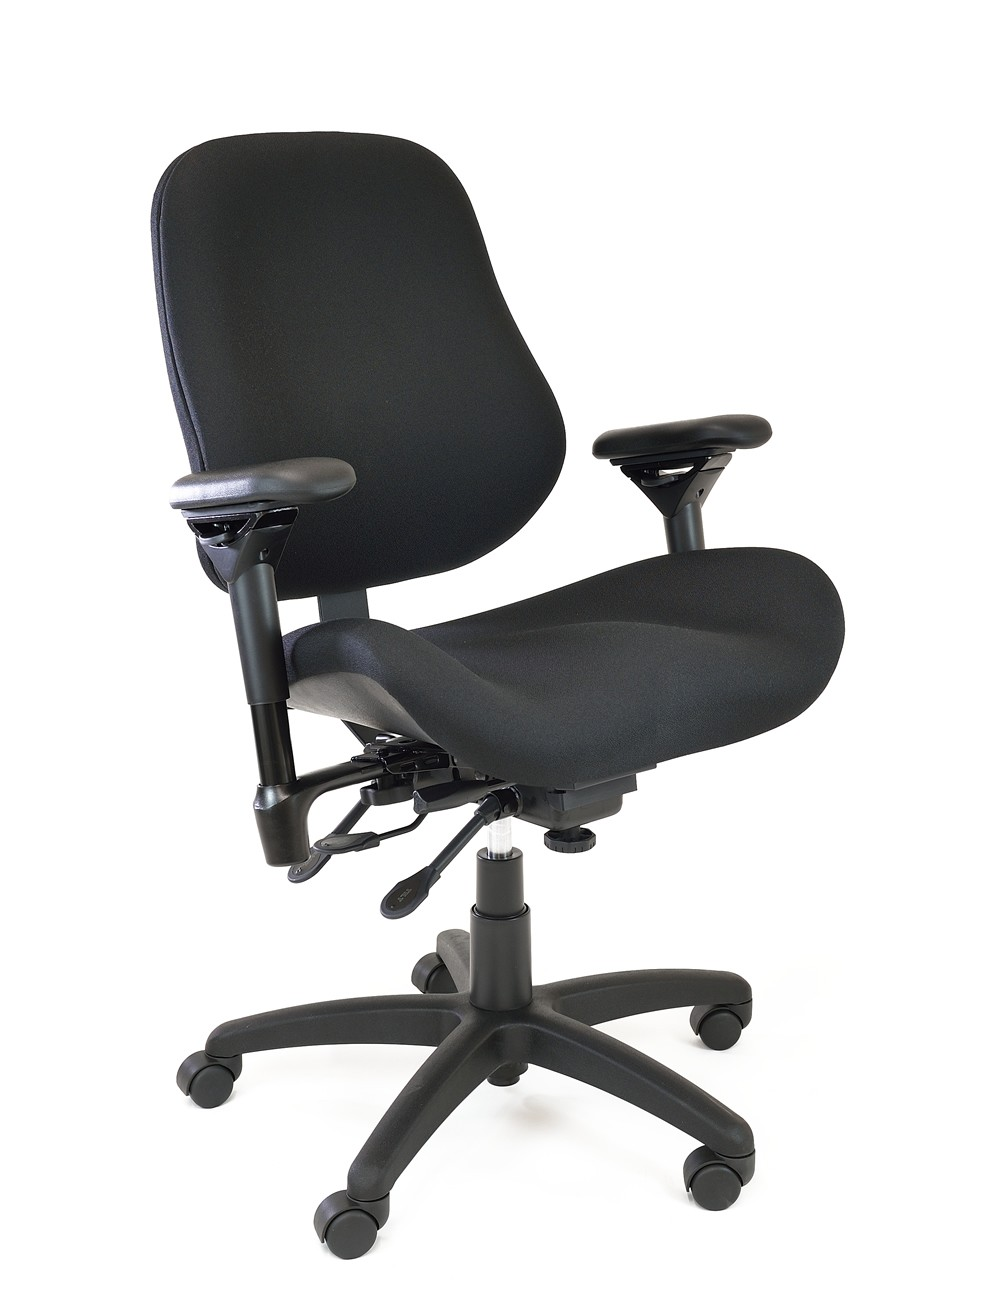 Groovy Bodybilt Big And Tall Office Chair J2504 Download Free Architecture Designs Scobabritishbridgeorg